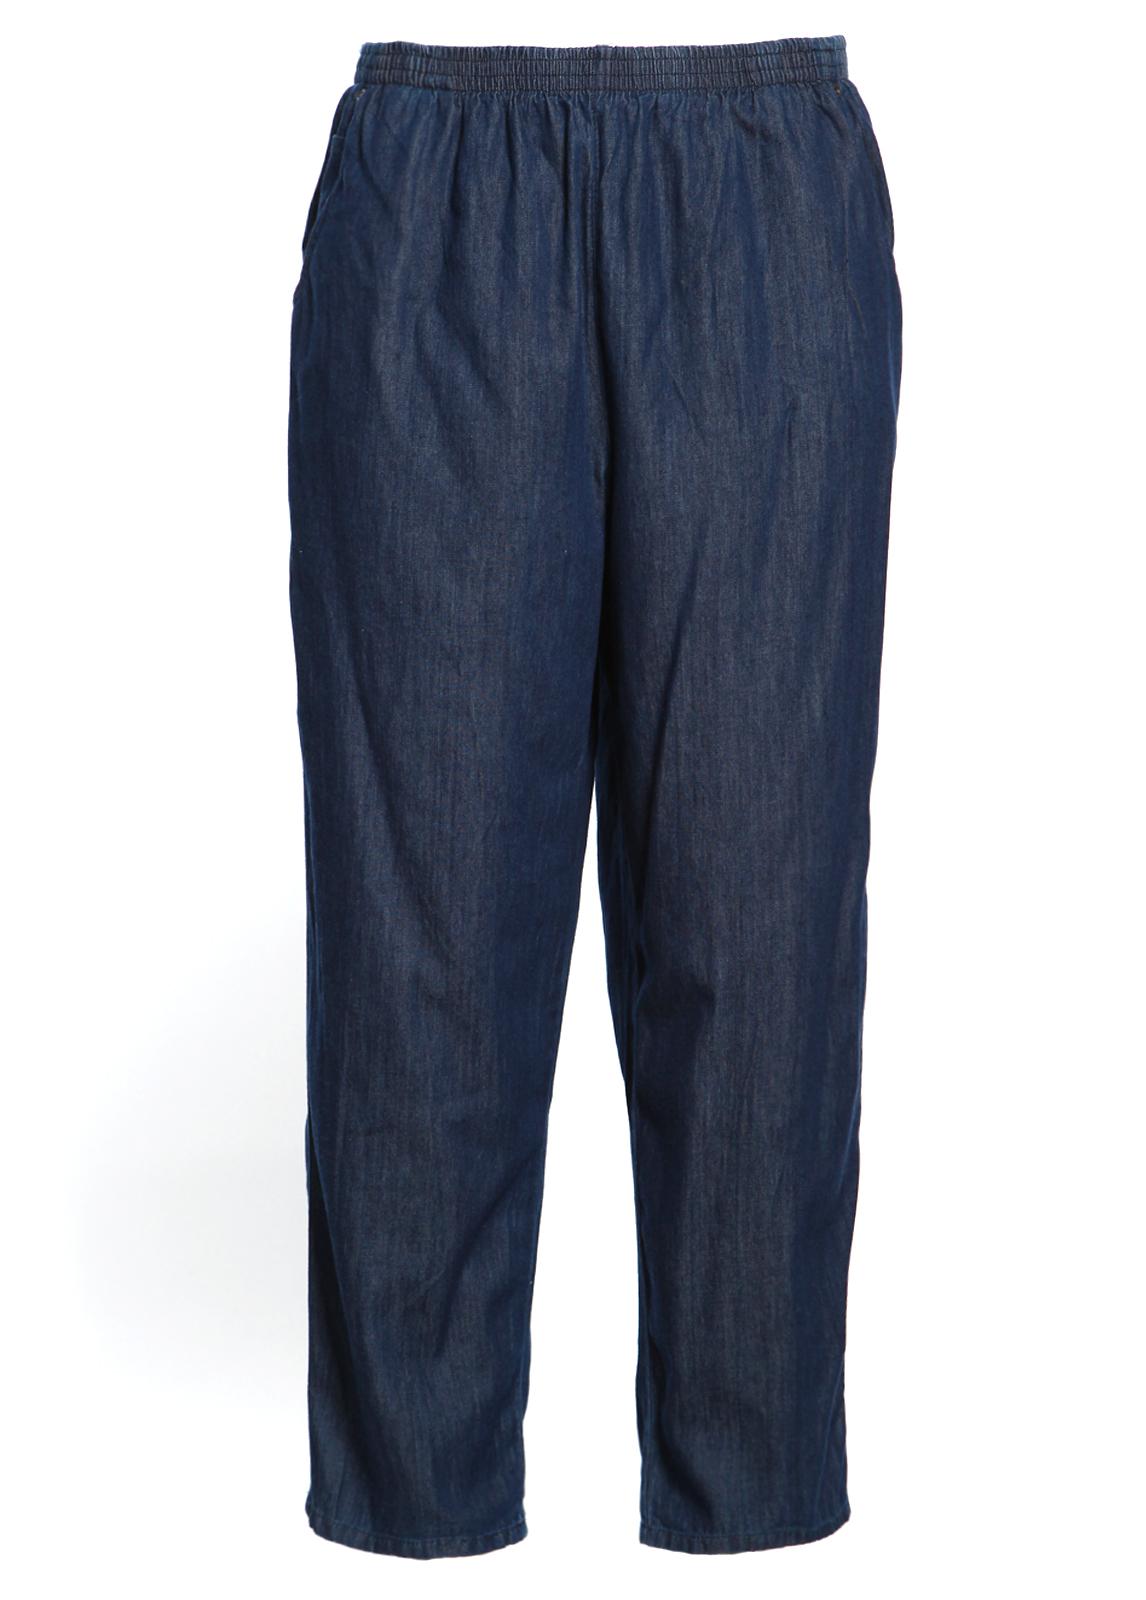 Perfect Laura Scott Women39s Elastic Waist Jeans  Sears